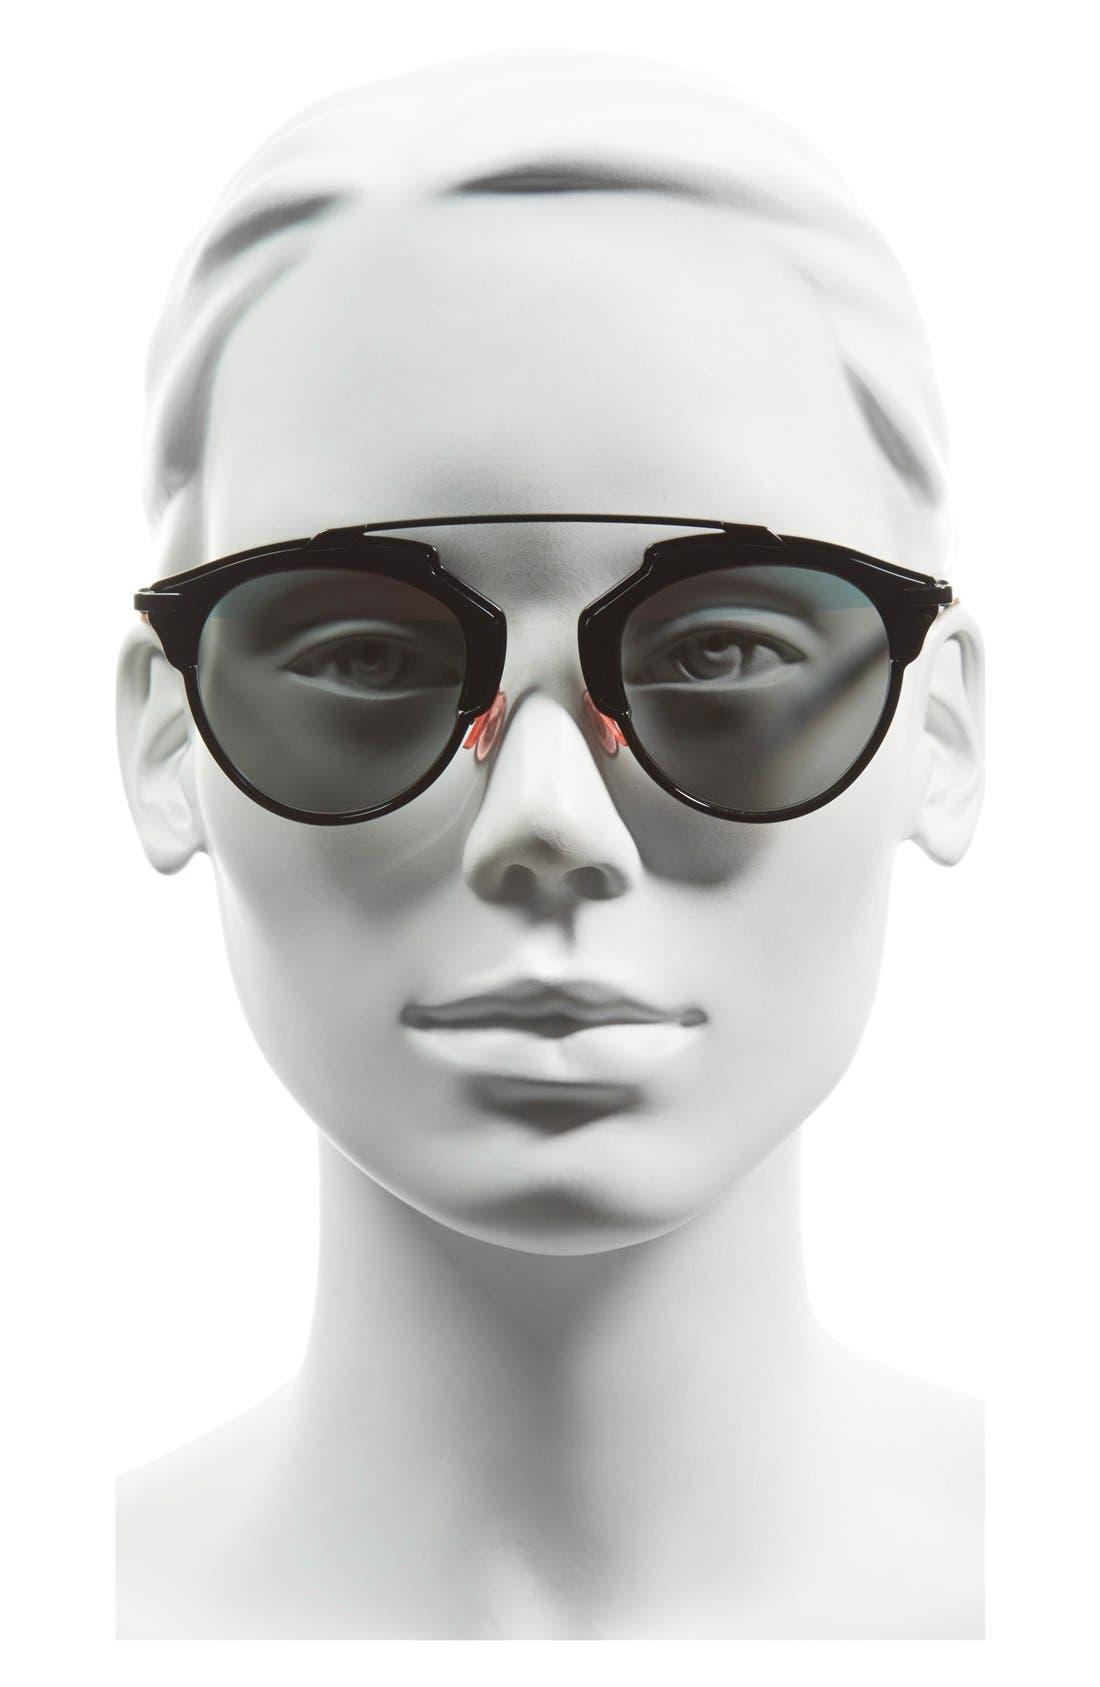 So Real 48mm Brow Bar Sunglasses,                             Alternate thumbnail 29, color,